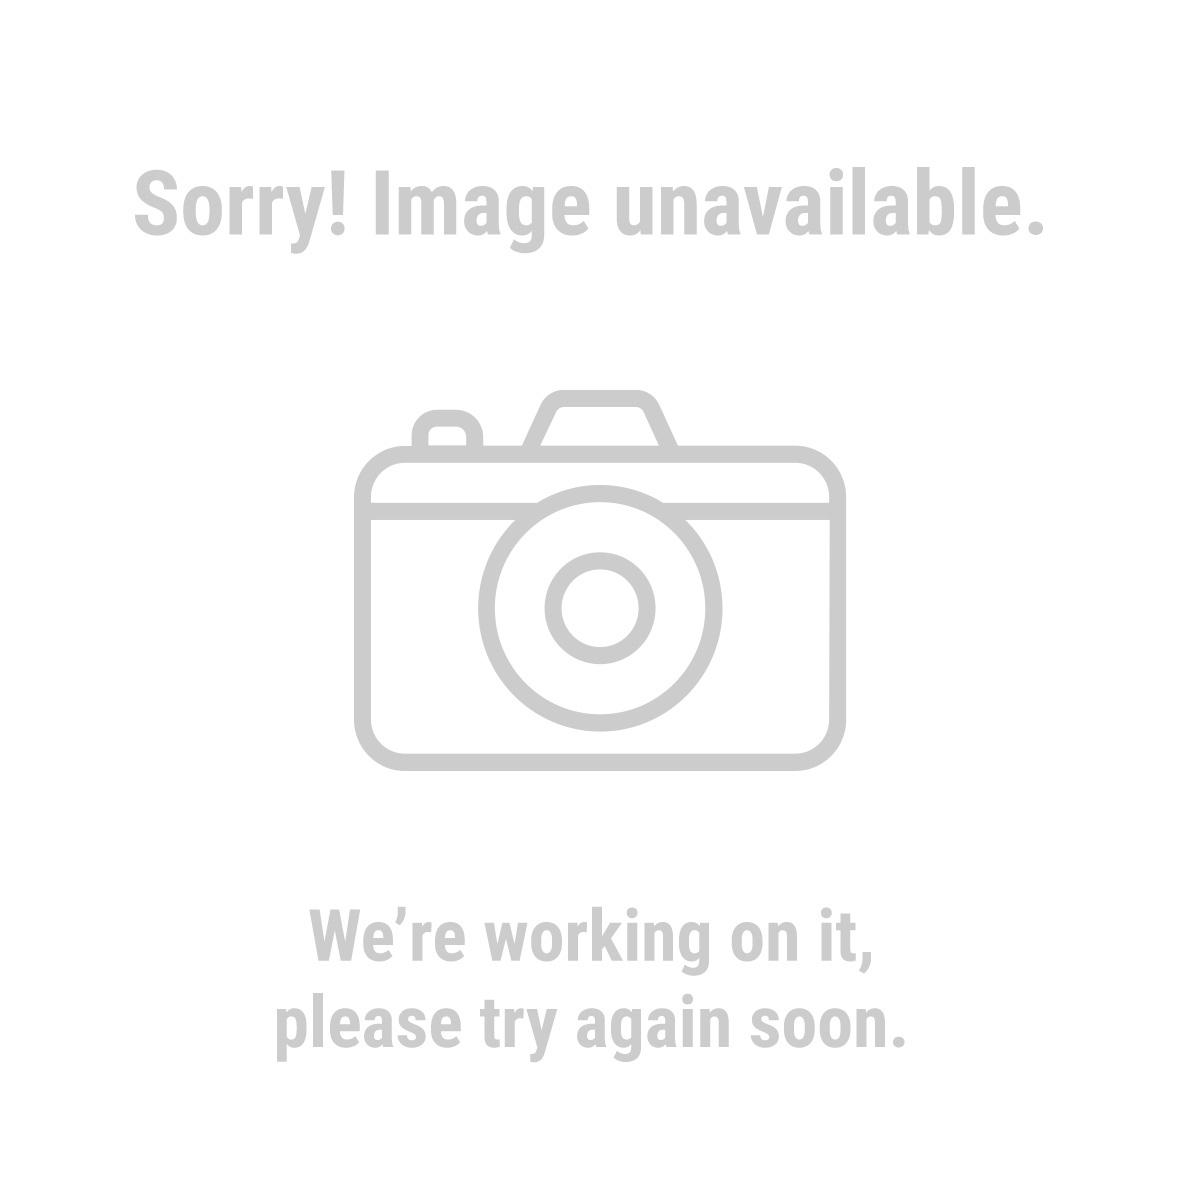 Central Hydraulics® 33884 2200 lb. 2-Stage Transmission Jack